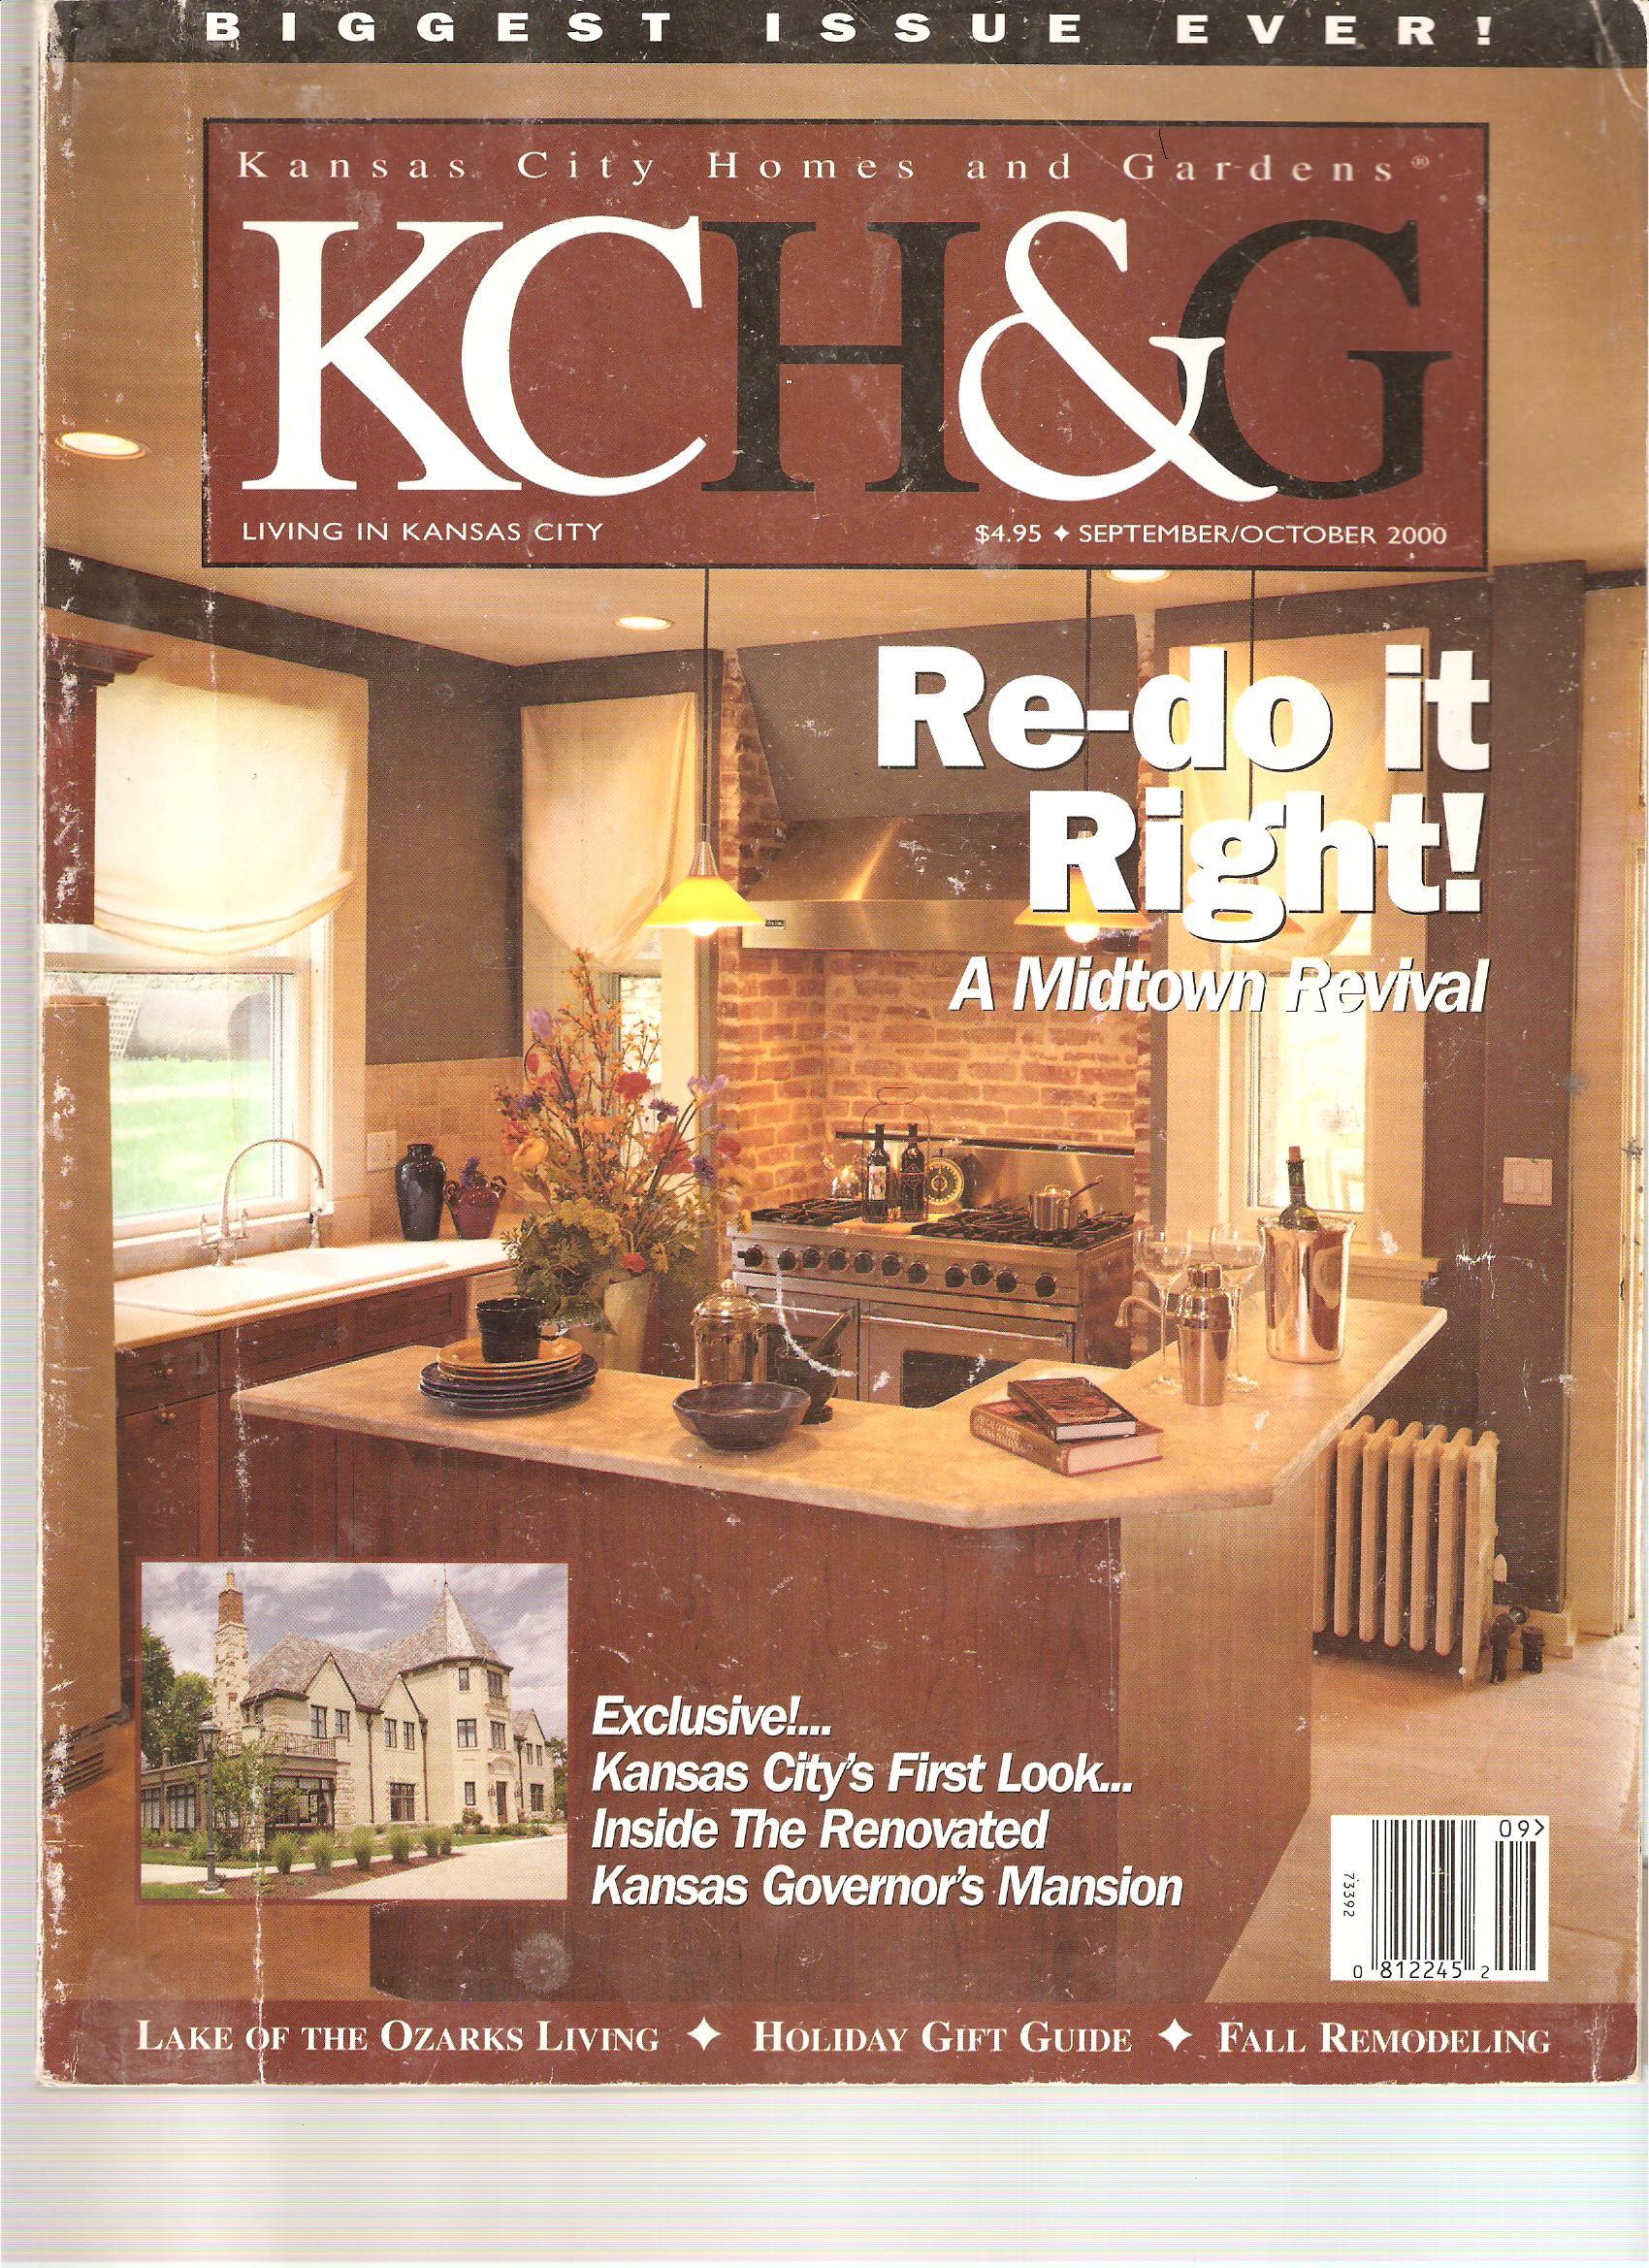 KCHG Earl pg 1 2000-1